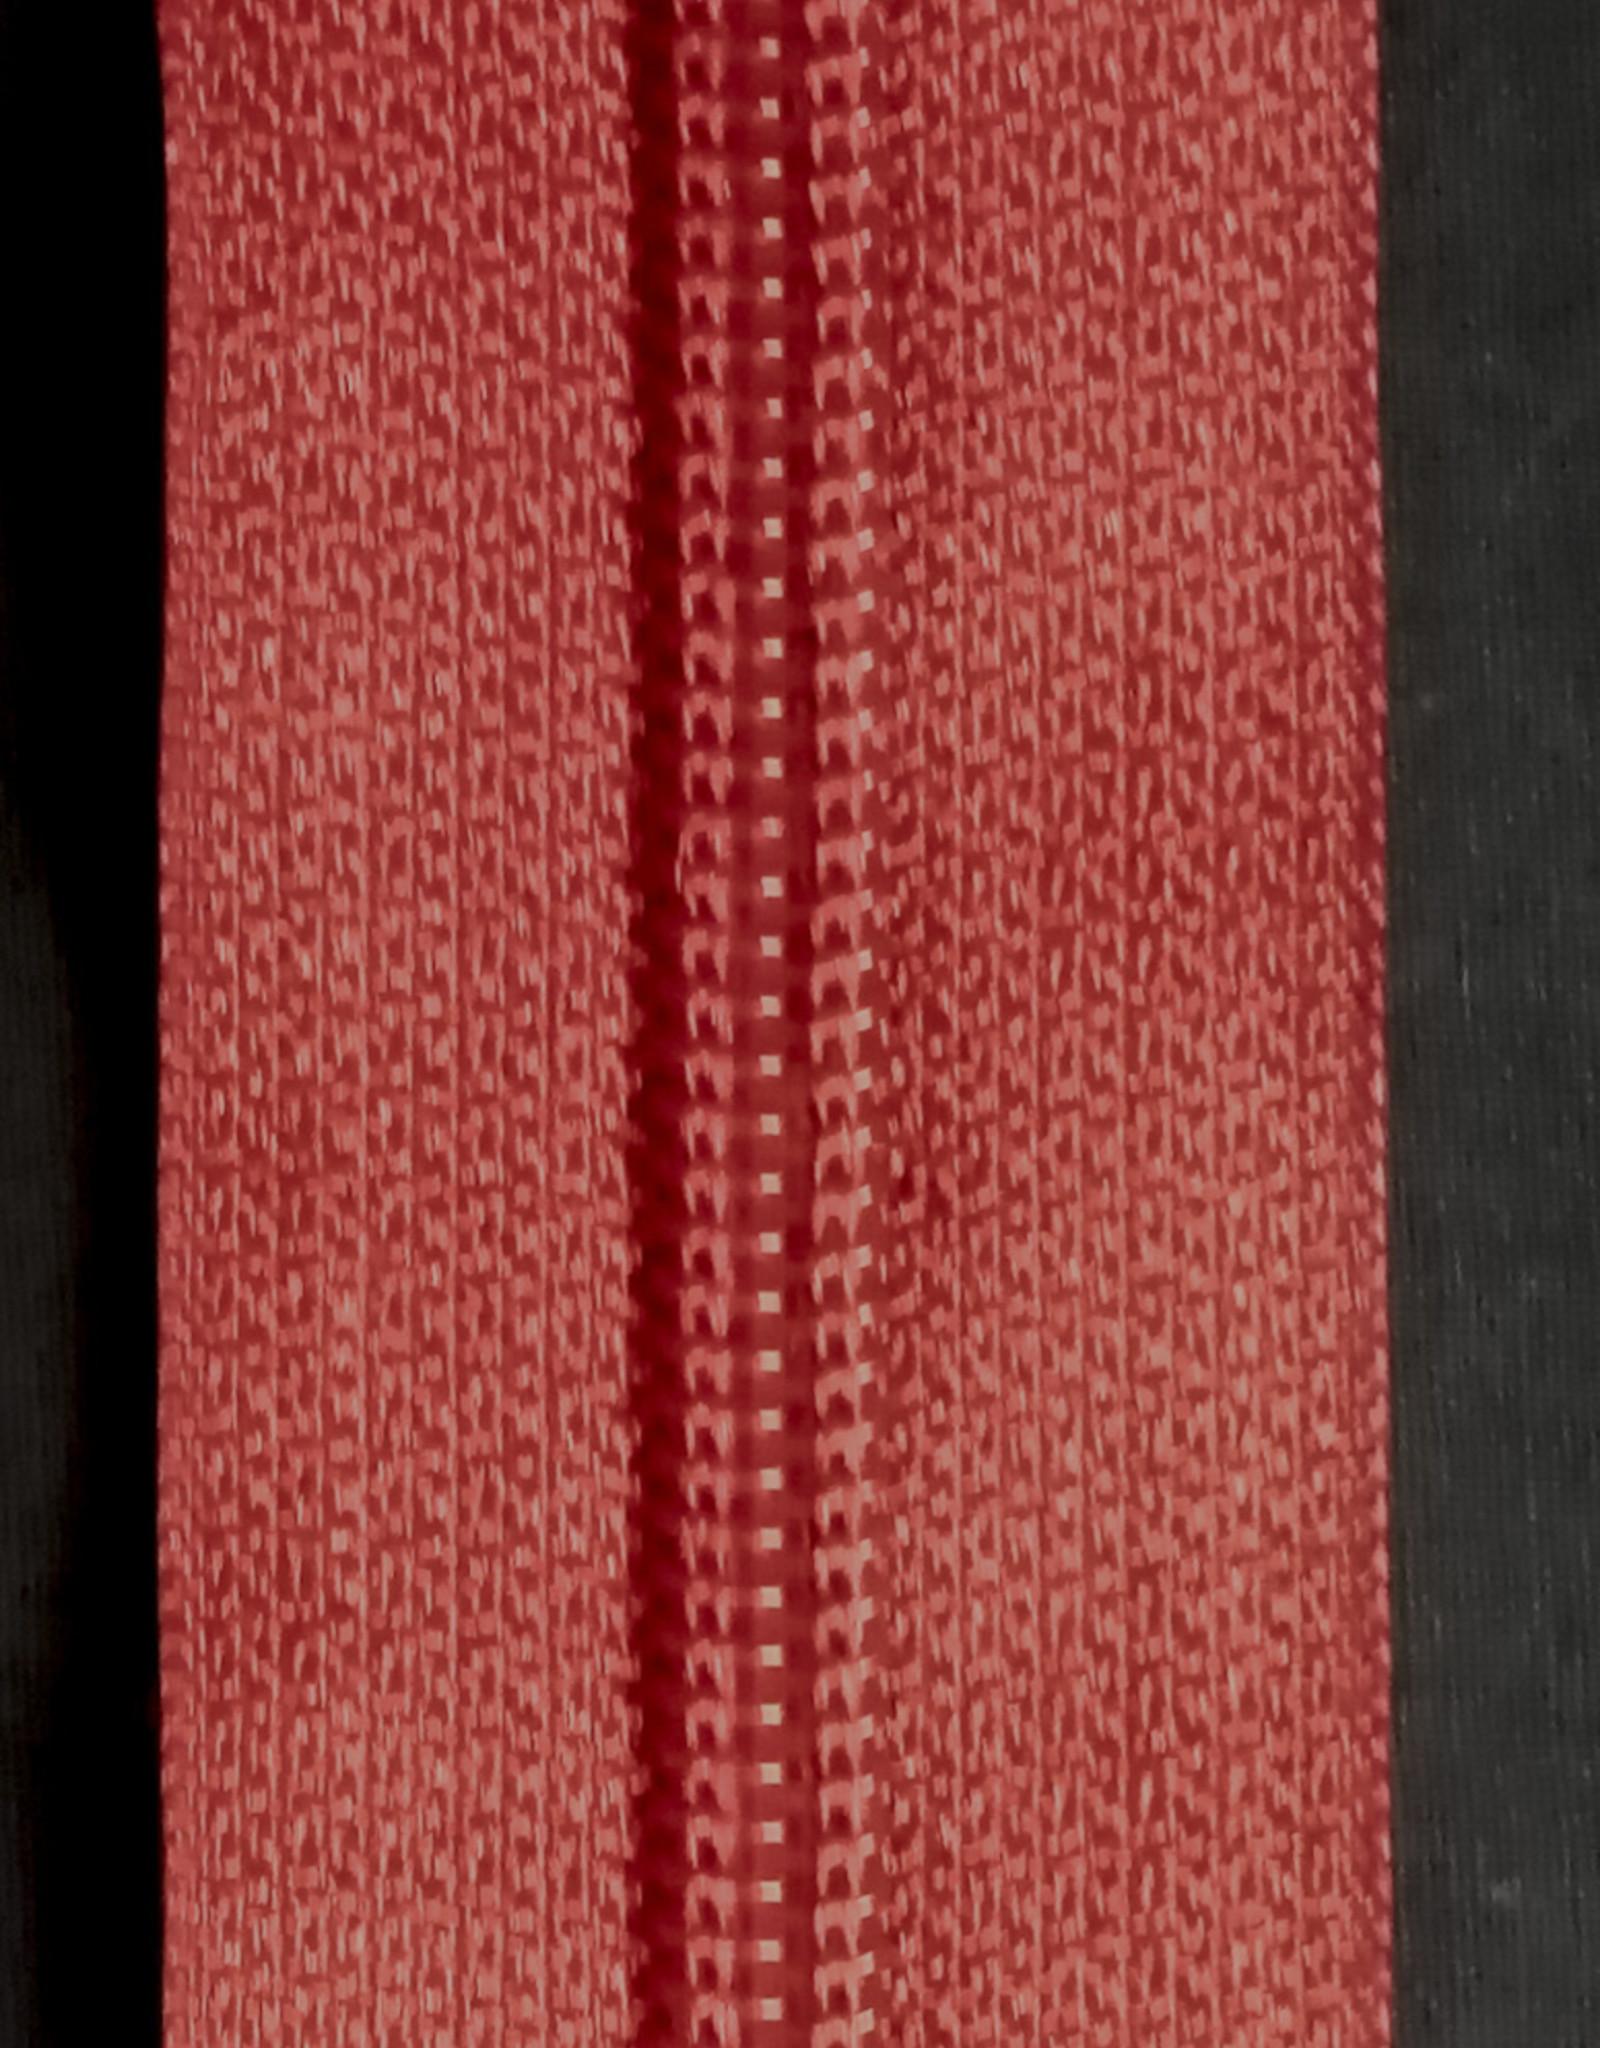 Union Knopf Endlosreißverschluss 5 mm weinrot